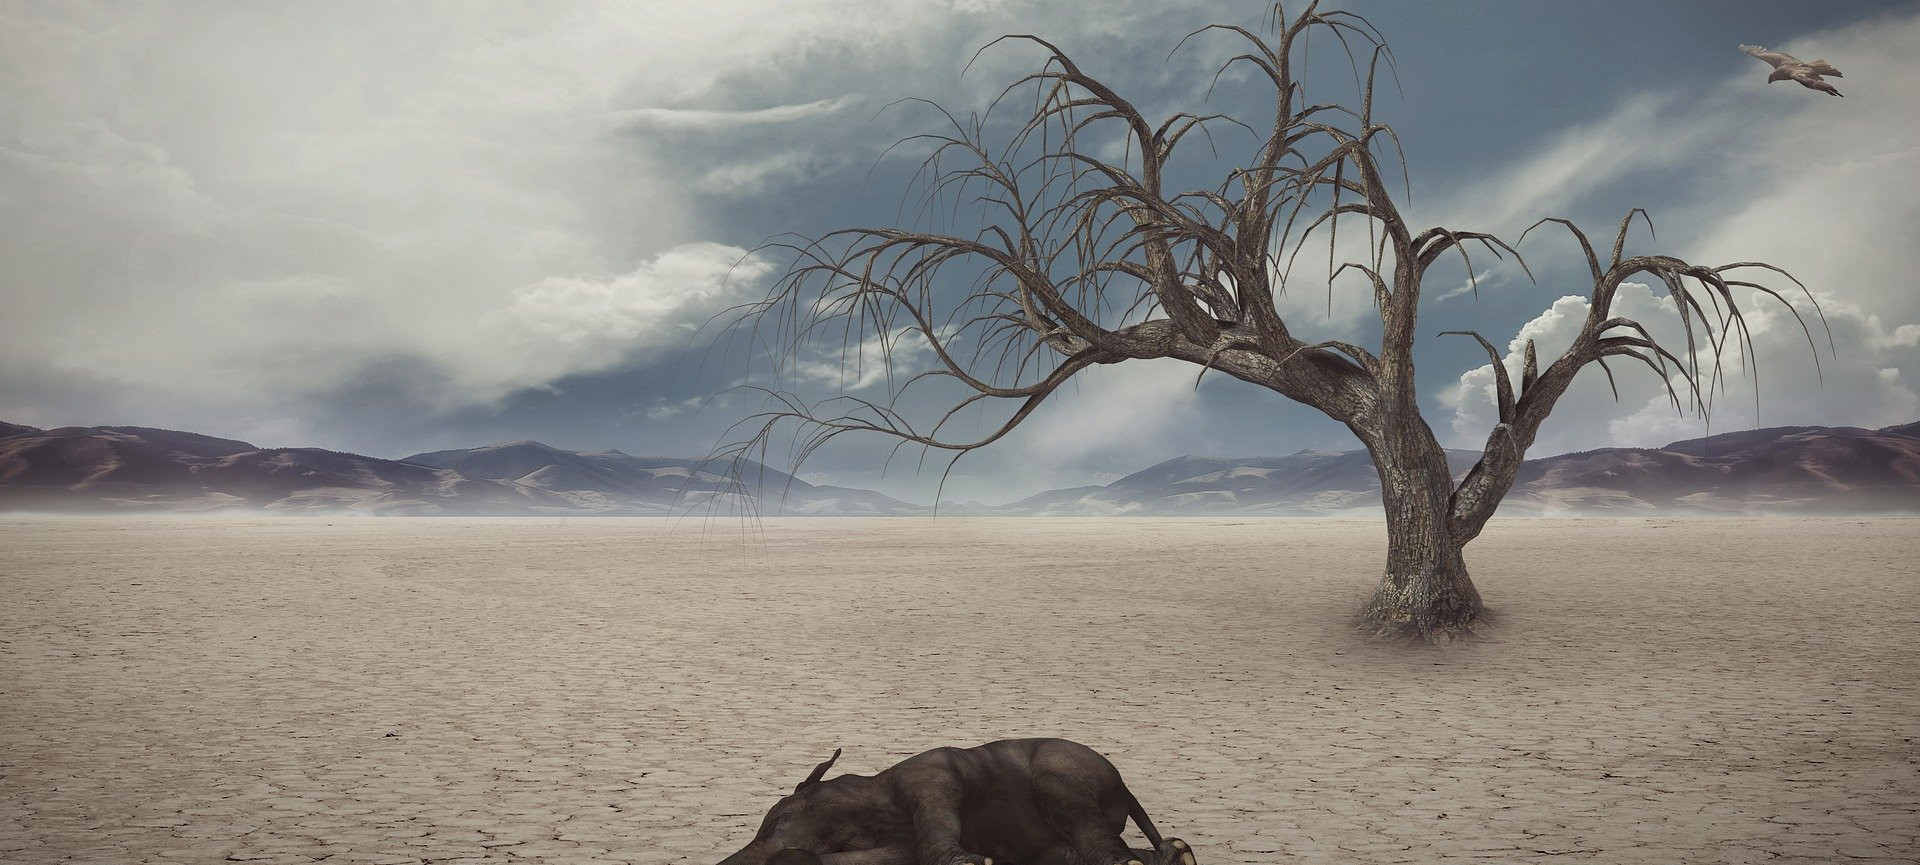 Drought(1).jpg